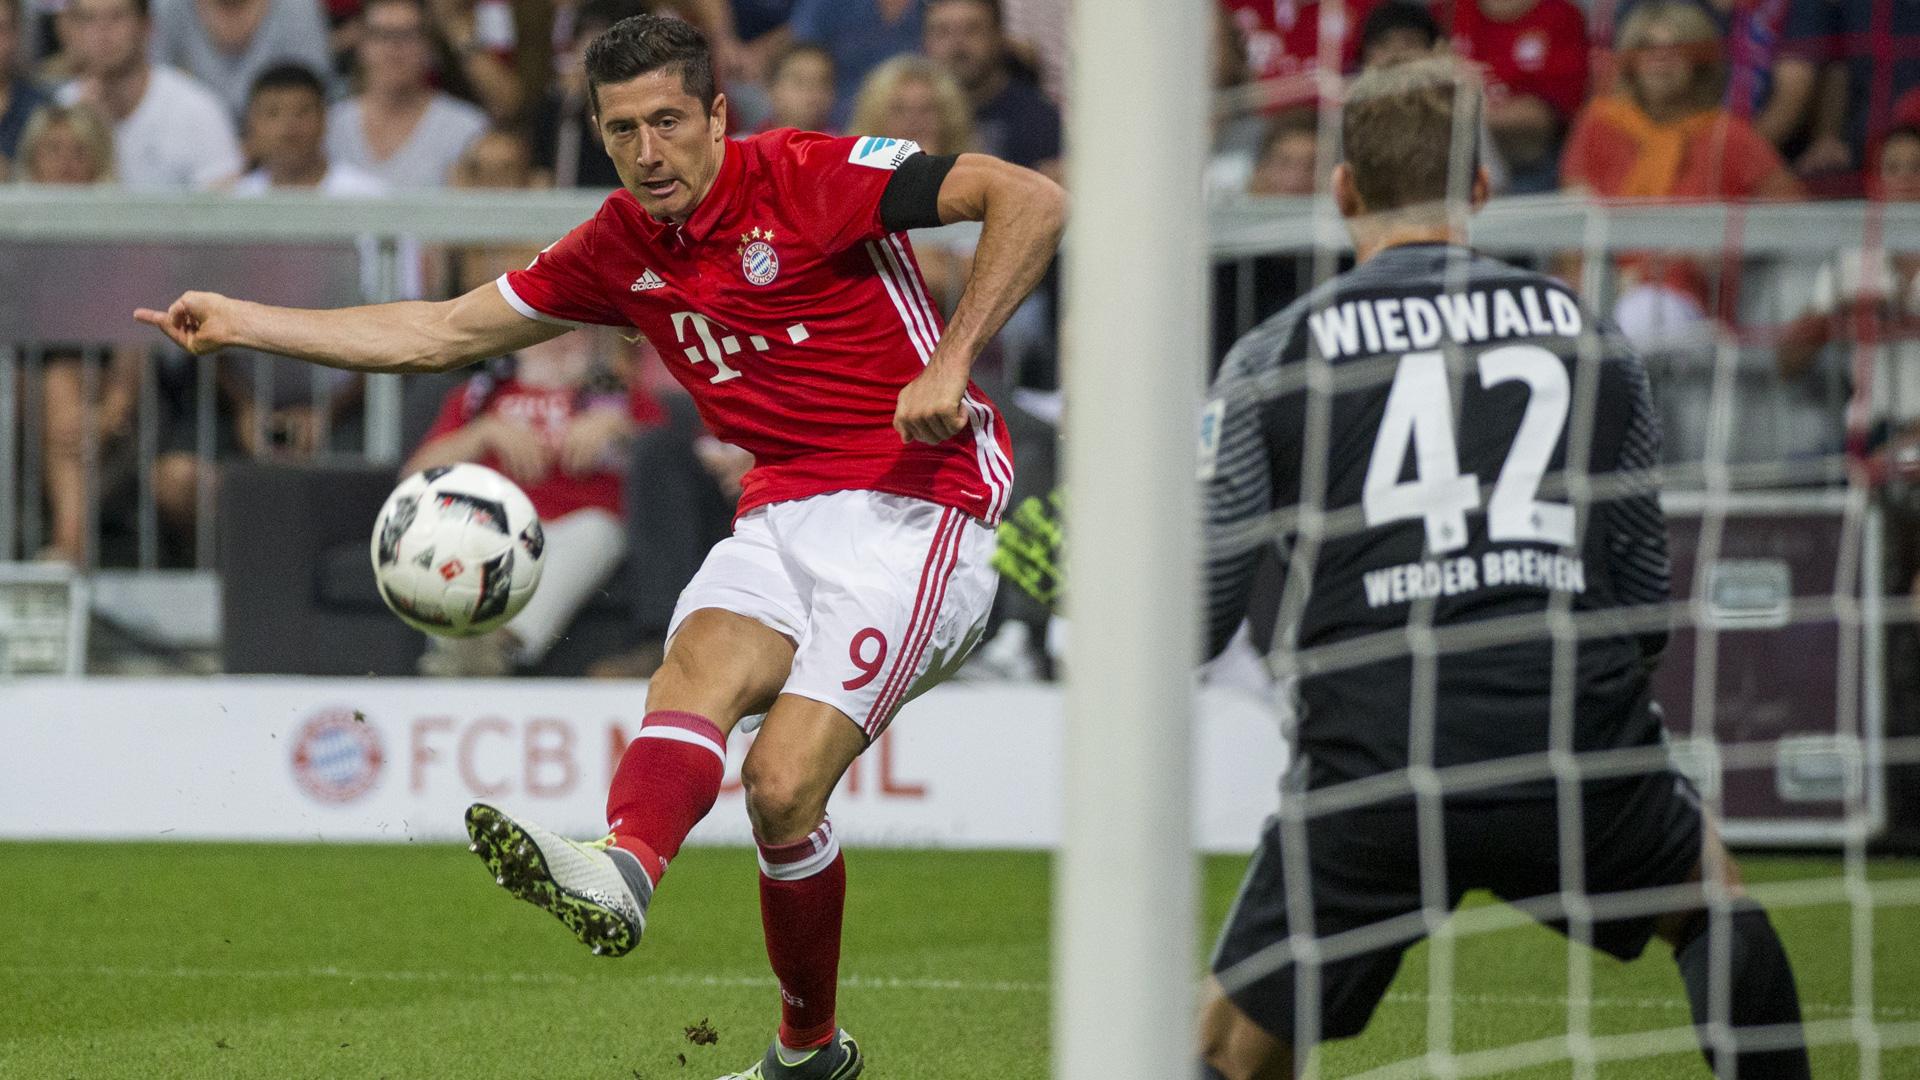 Robert Lewandowski Bayern Bremen Wiedwald